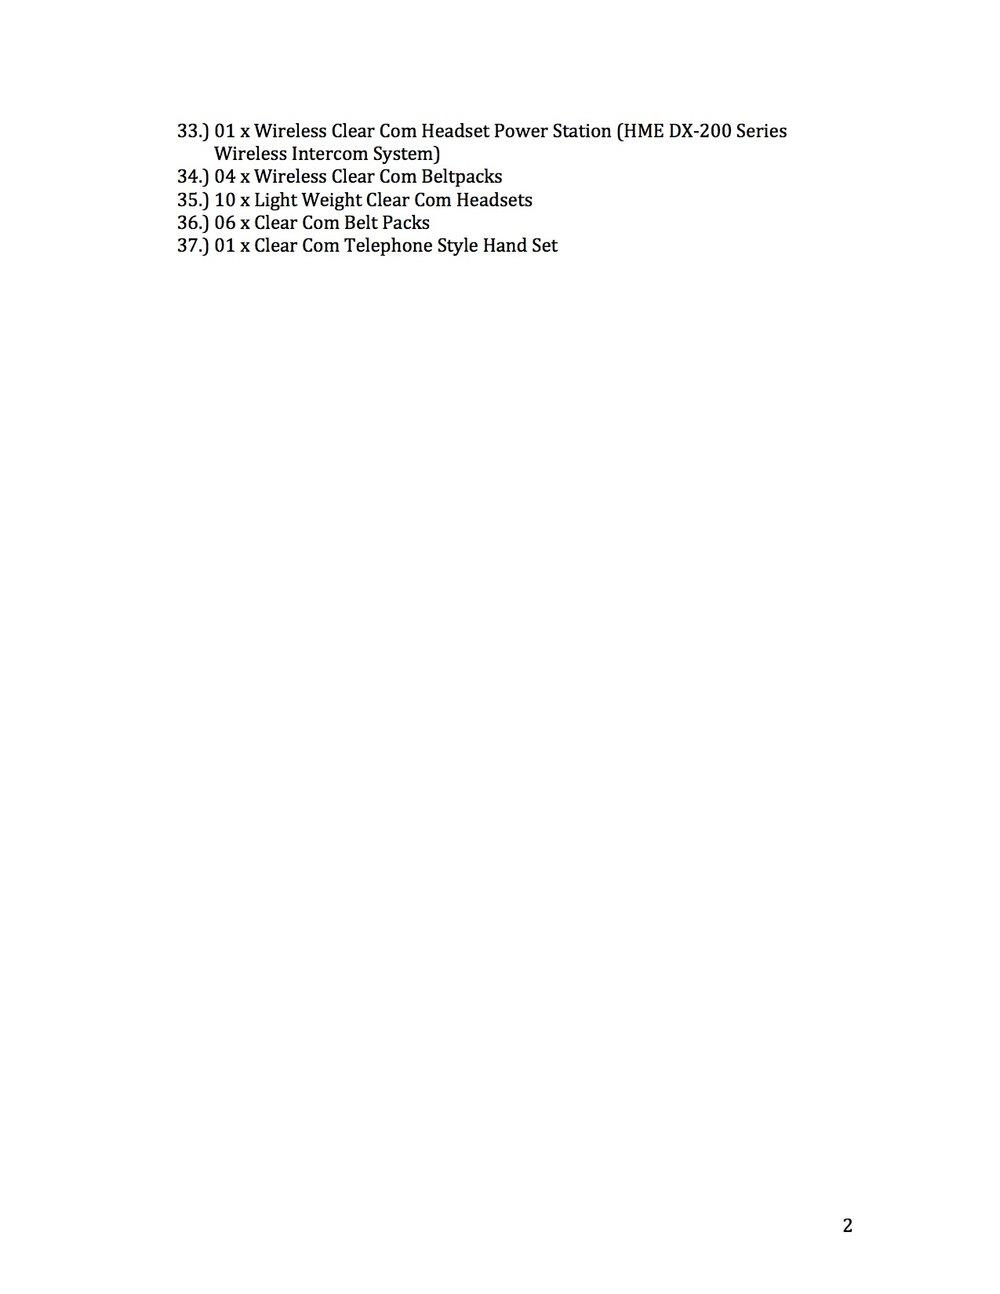 07 Tribes Equipment List 1-10-15.jpg